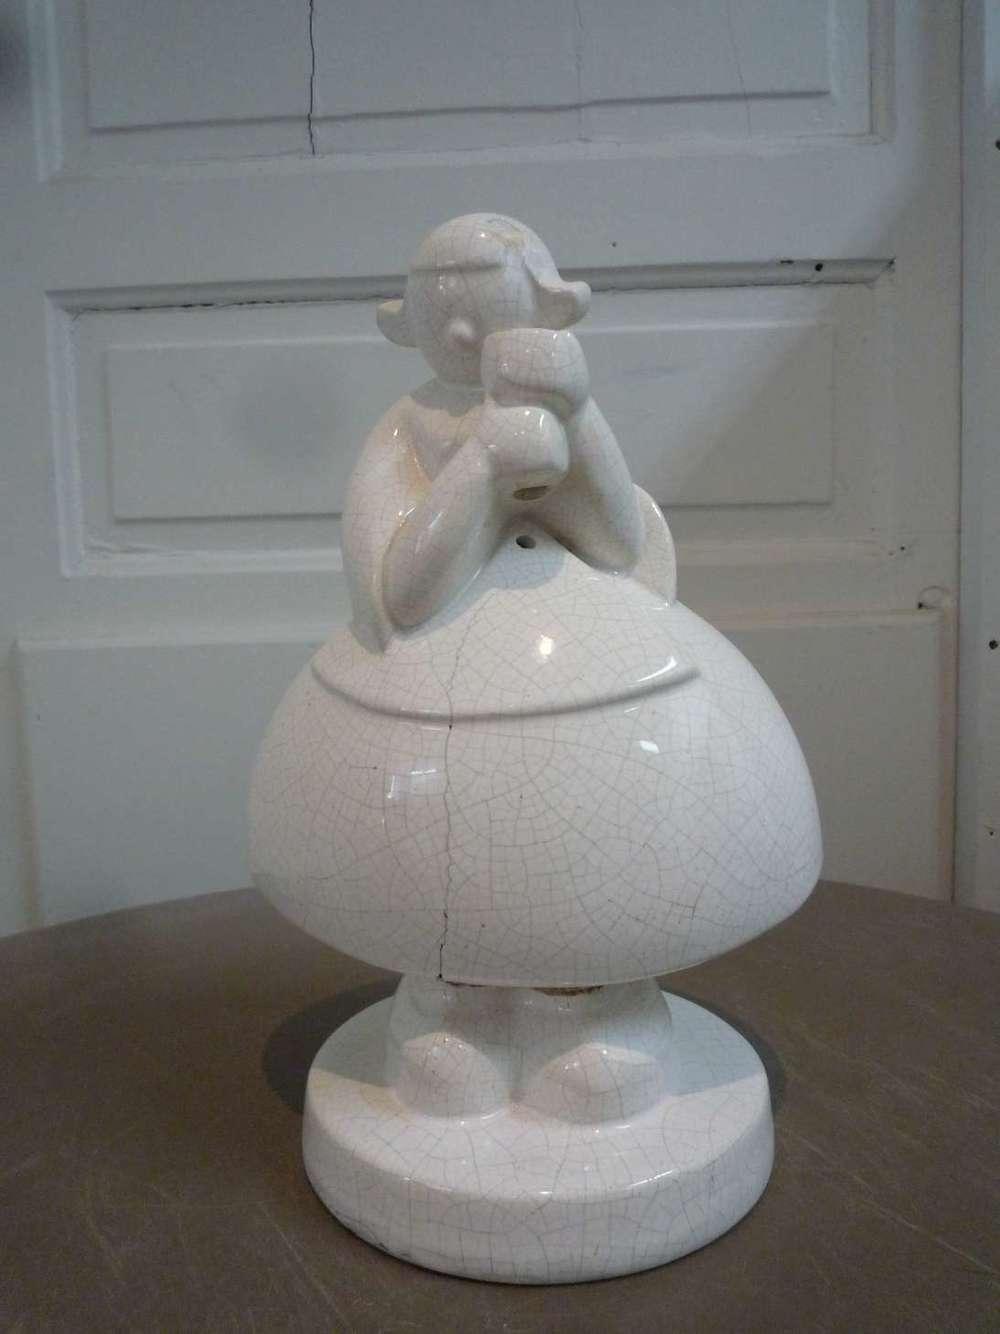 faience-email-robj-lampe-becassine-craquele-craquelures-art-1926-ateliers-restaurarte-restauration-ceramique-blanche.jpg